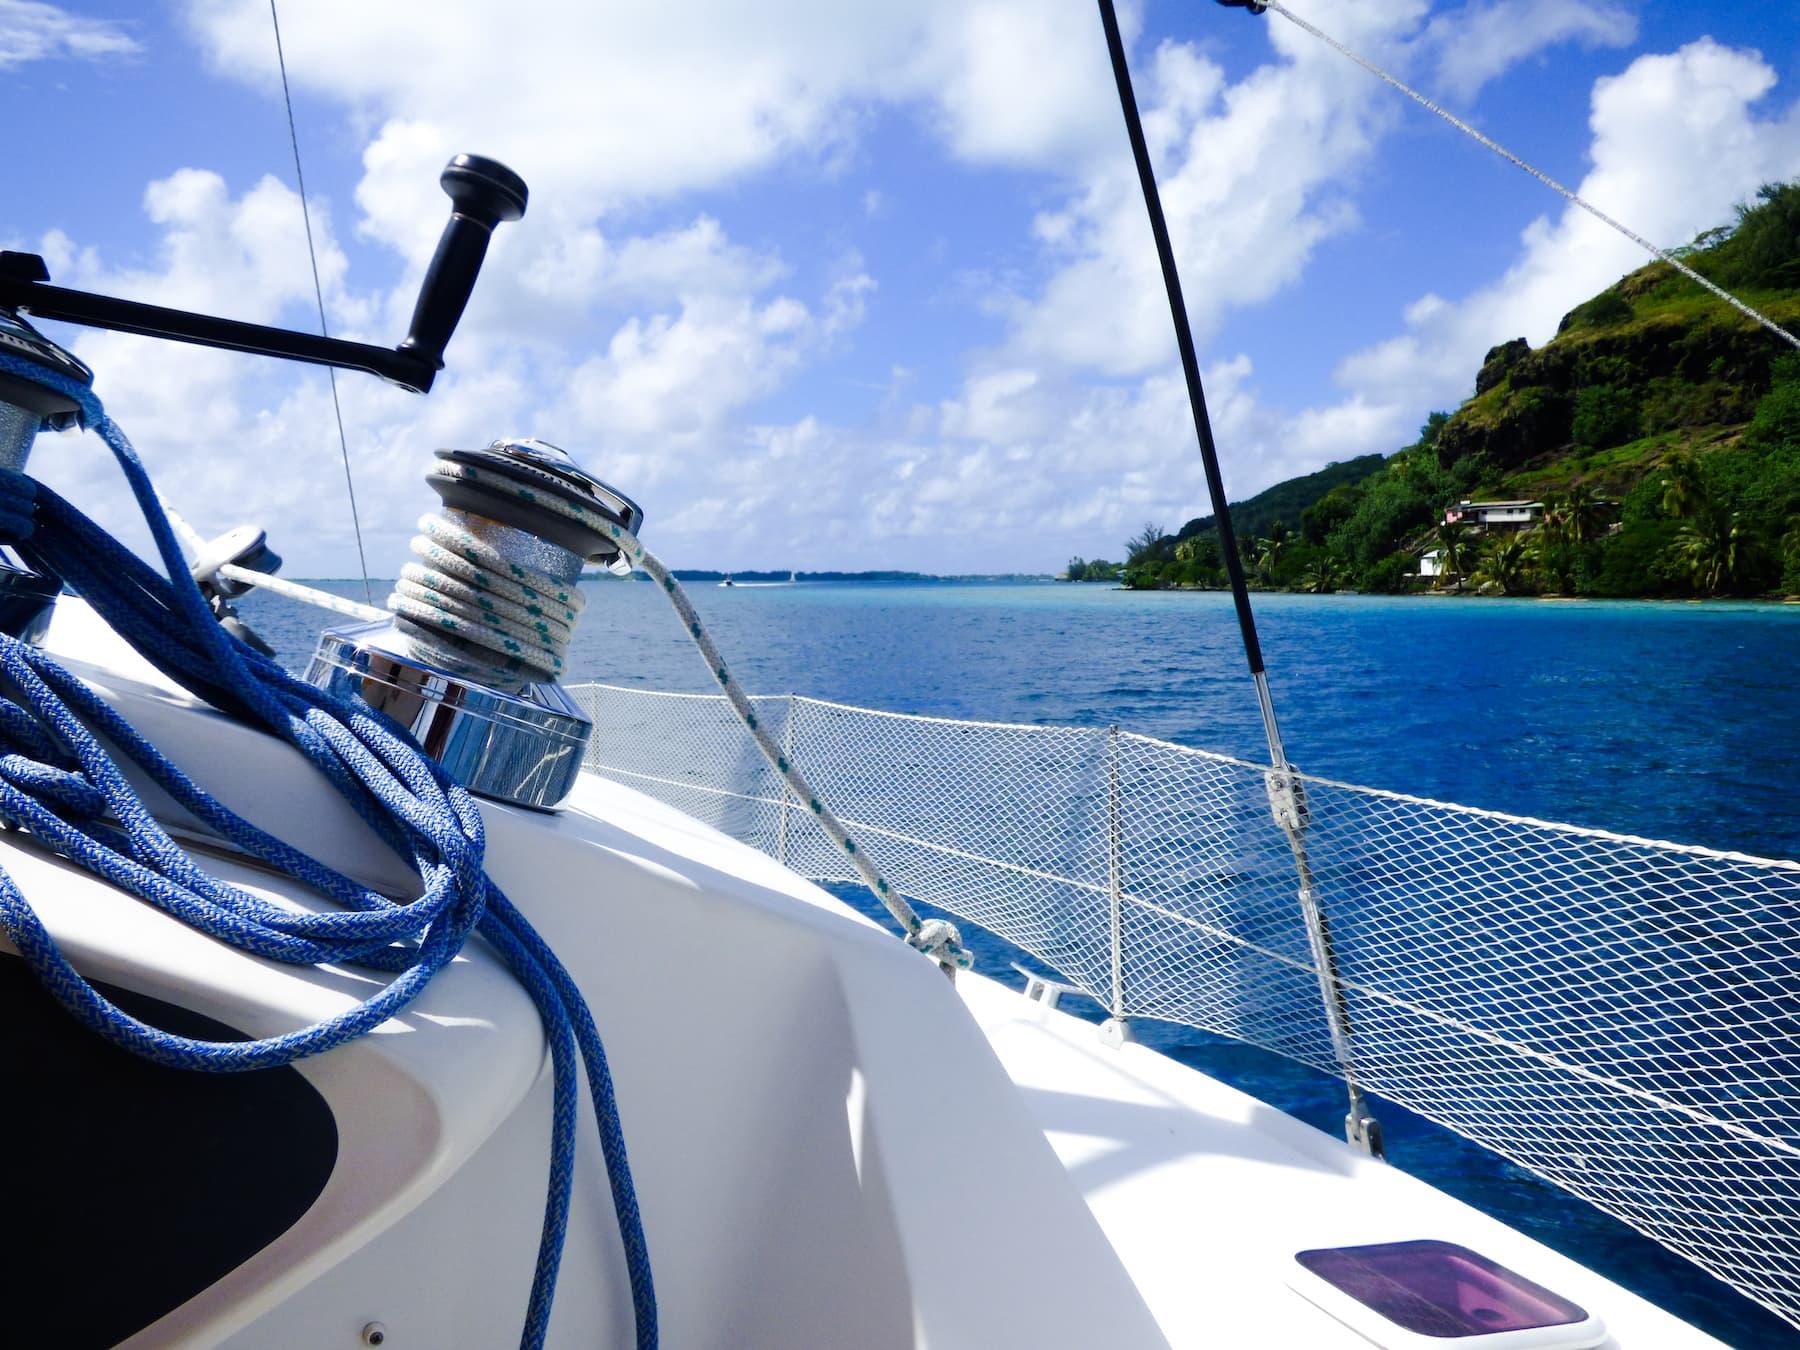 https://tahititourisme.ch/wp-content/uploads/2017/08/bateau-tlc-modif-13.jpg